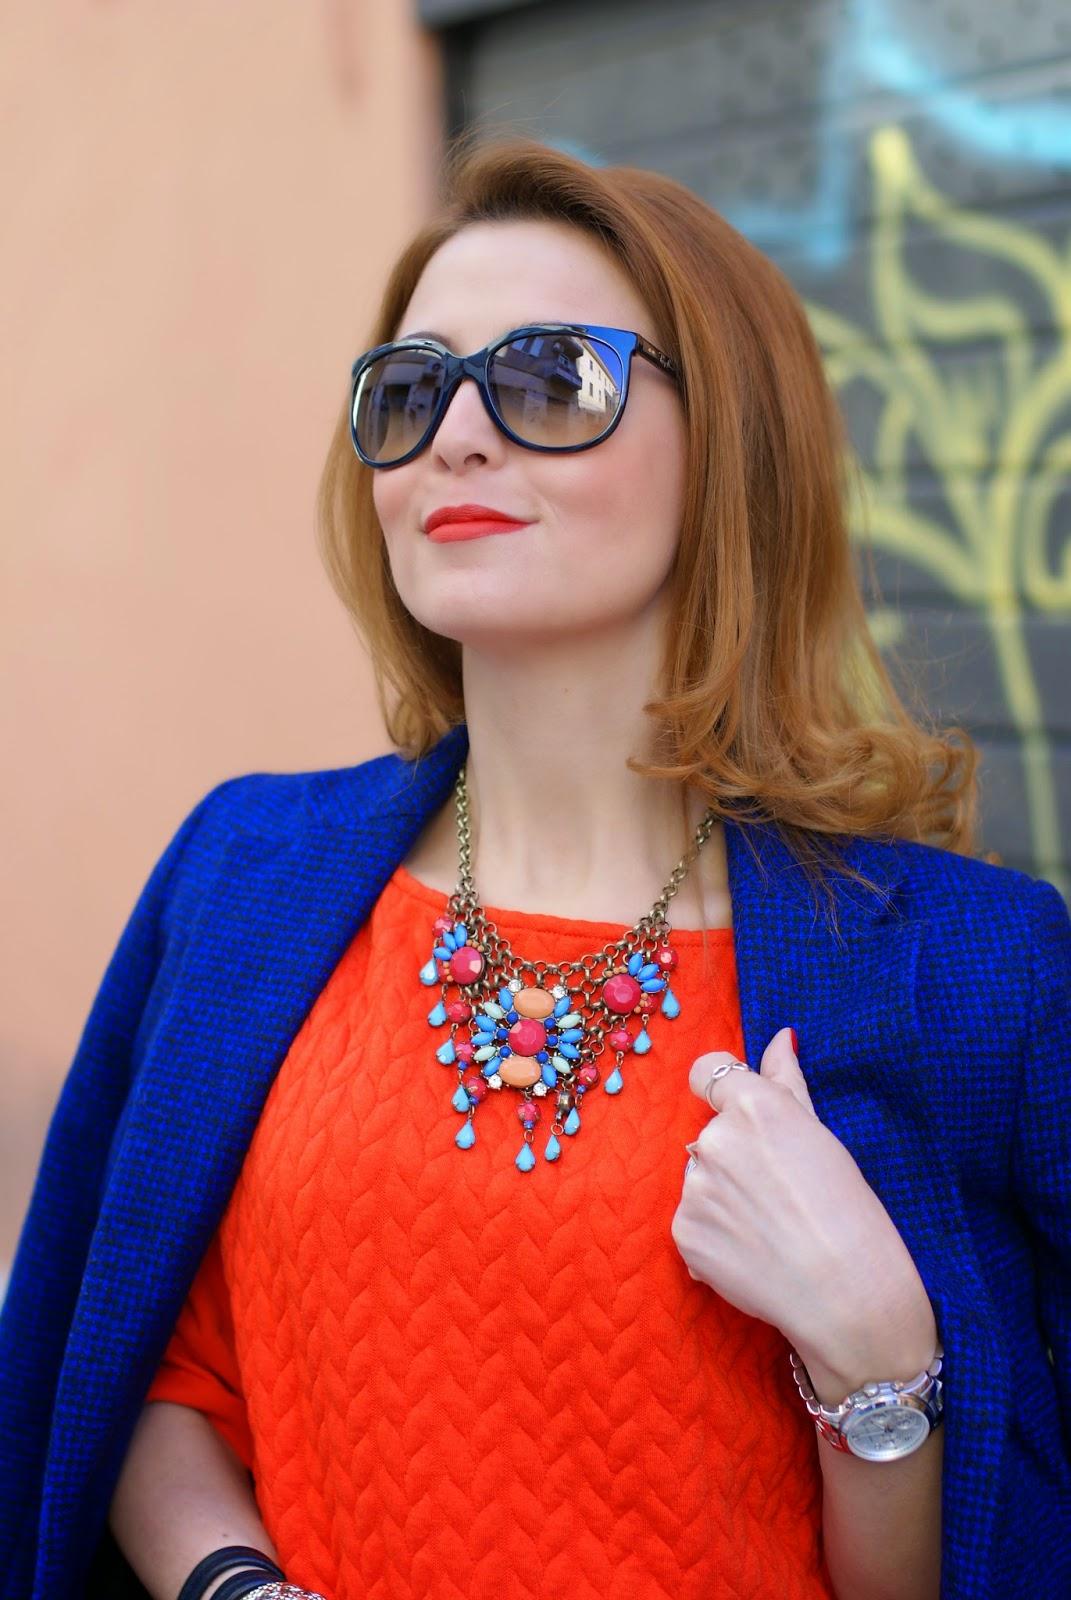 MA Lady Danger lipstick, side parted hair, ray-ban cat eye sunglasses, Miu Miu black tote, bijou brigitte necklace, Fashion and Cookies fashion blog, fashion blogger